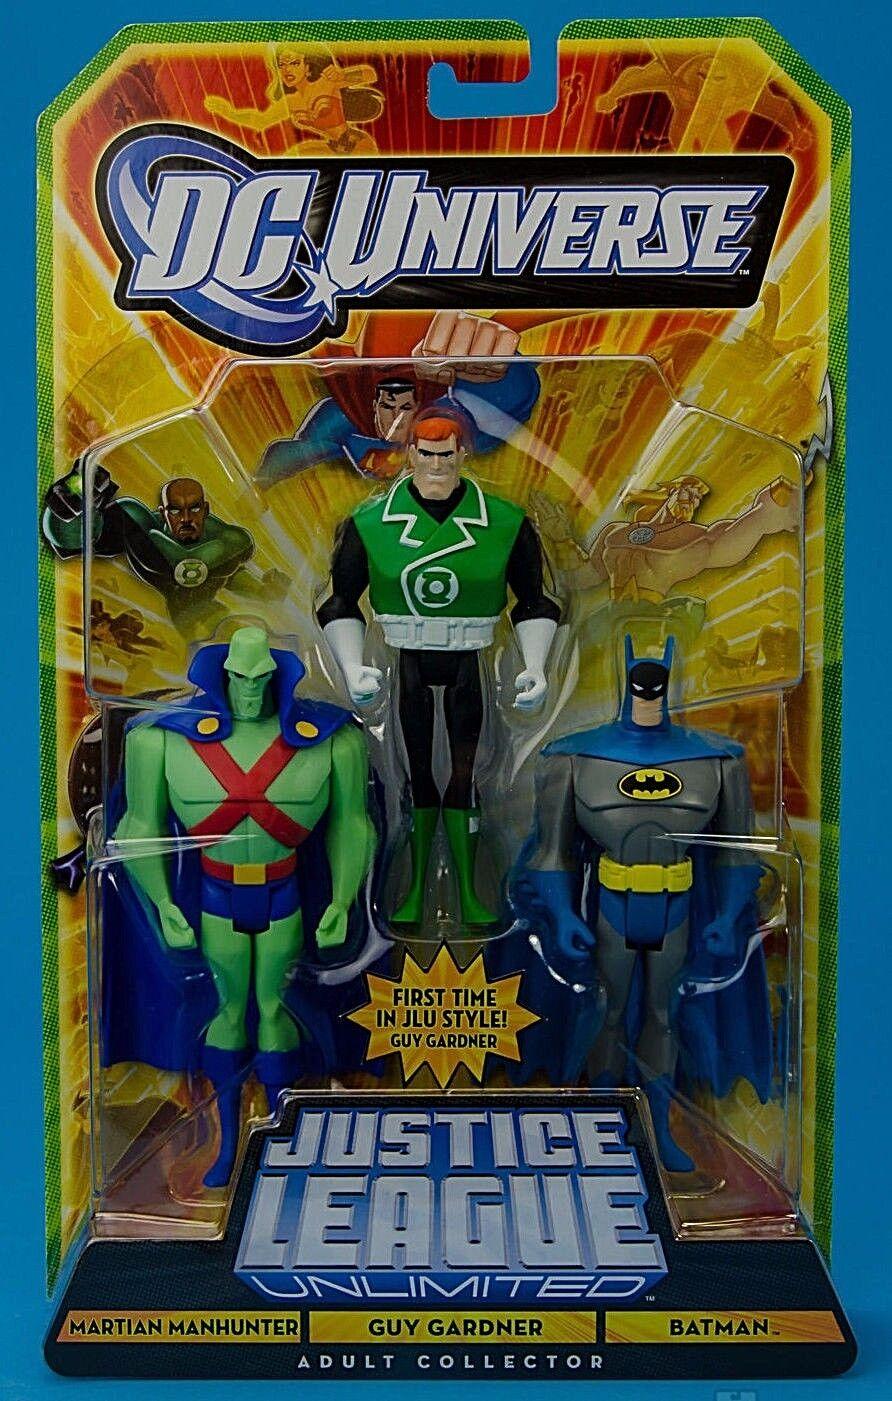 Dc universe_justiceleagueunlimited_martian manhunter_guy gardner_batman 4